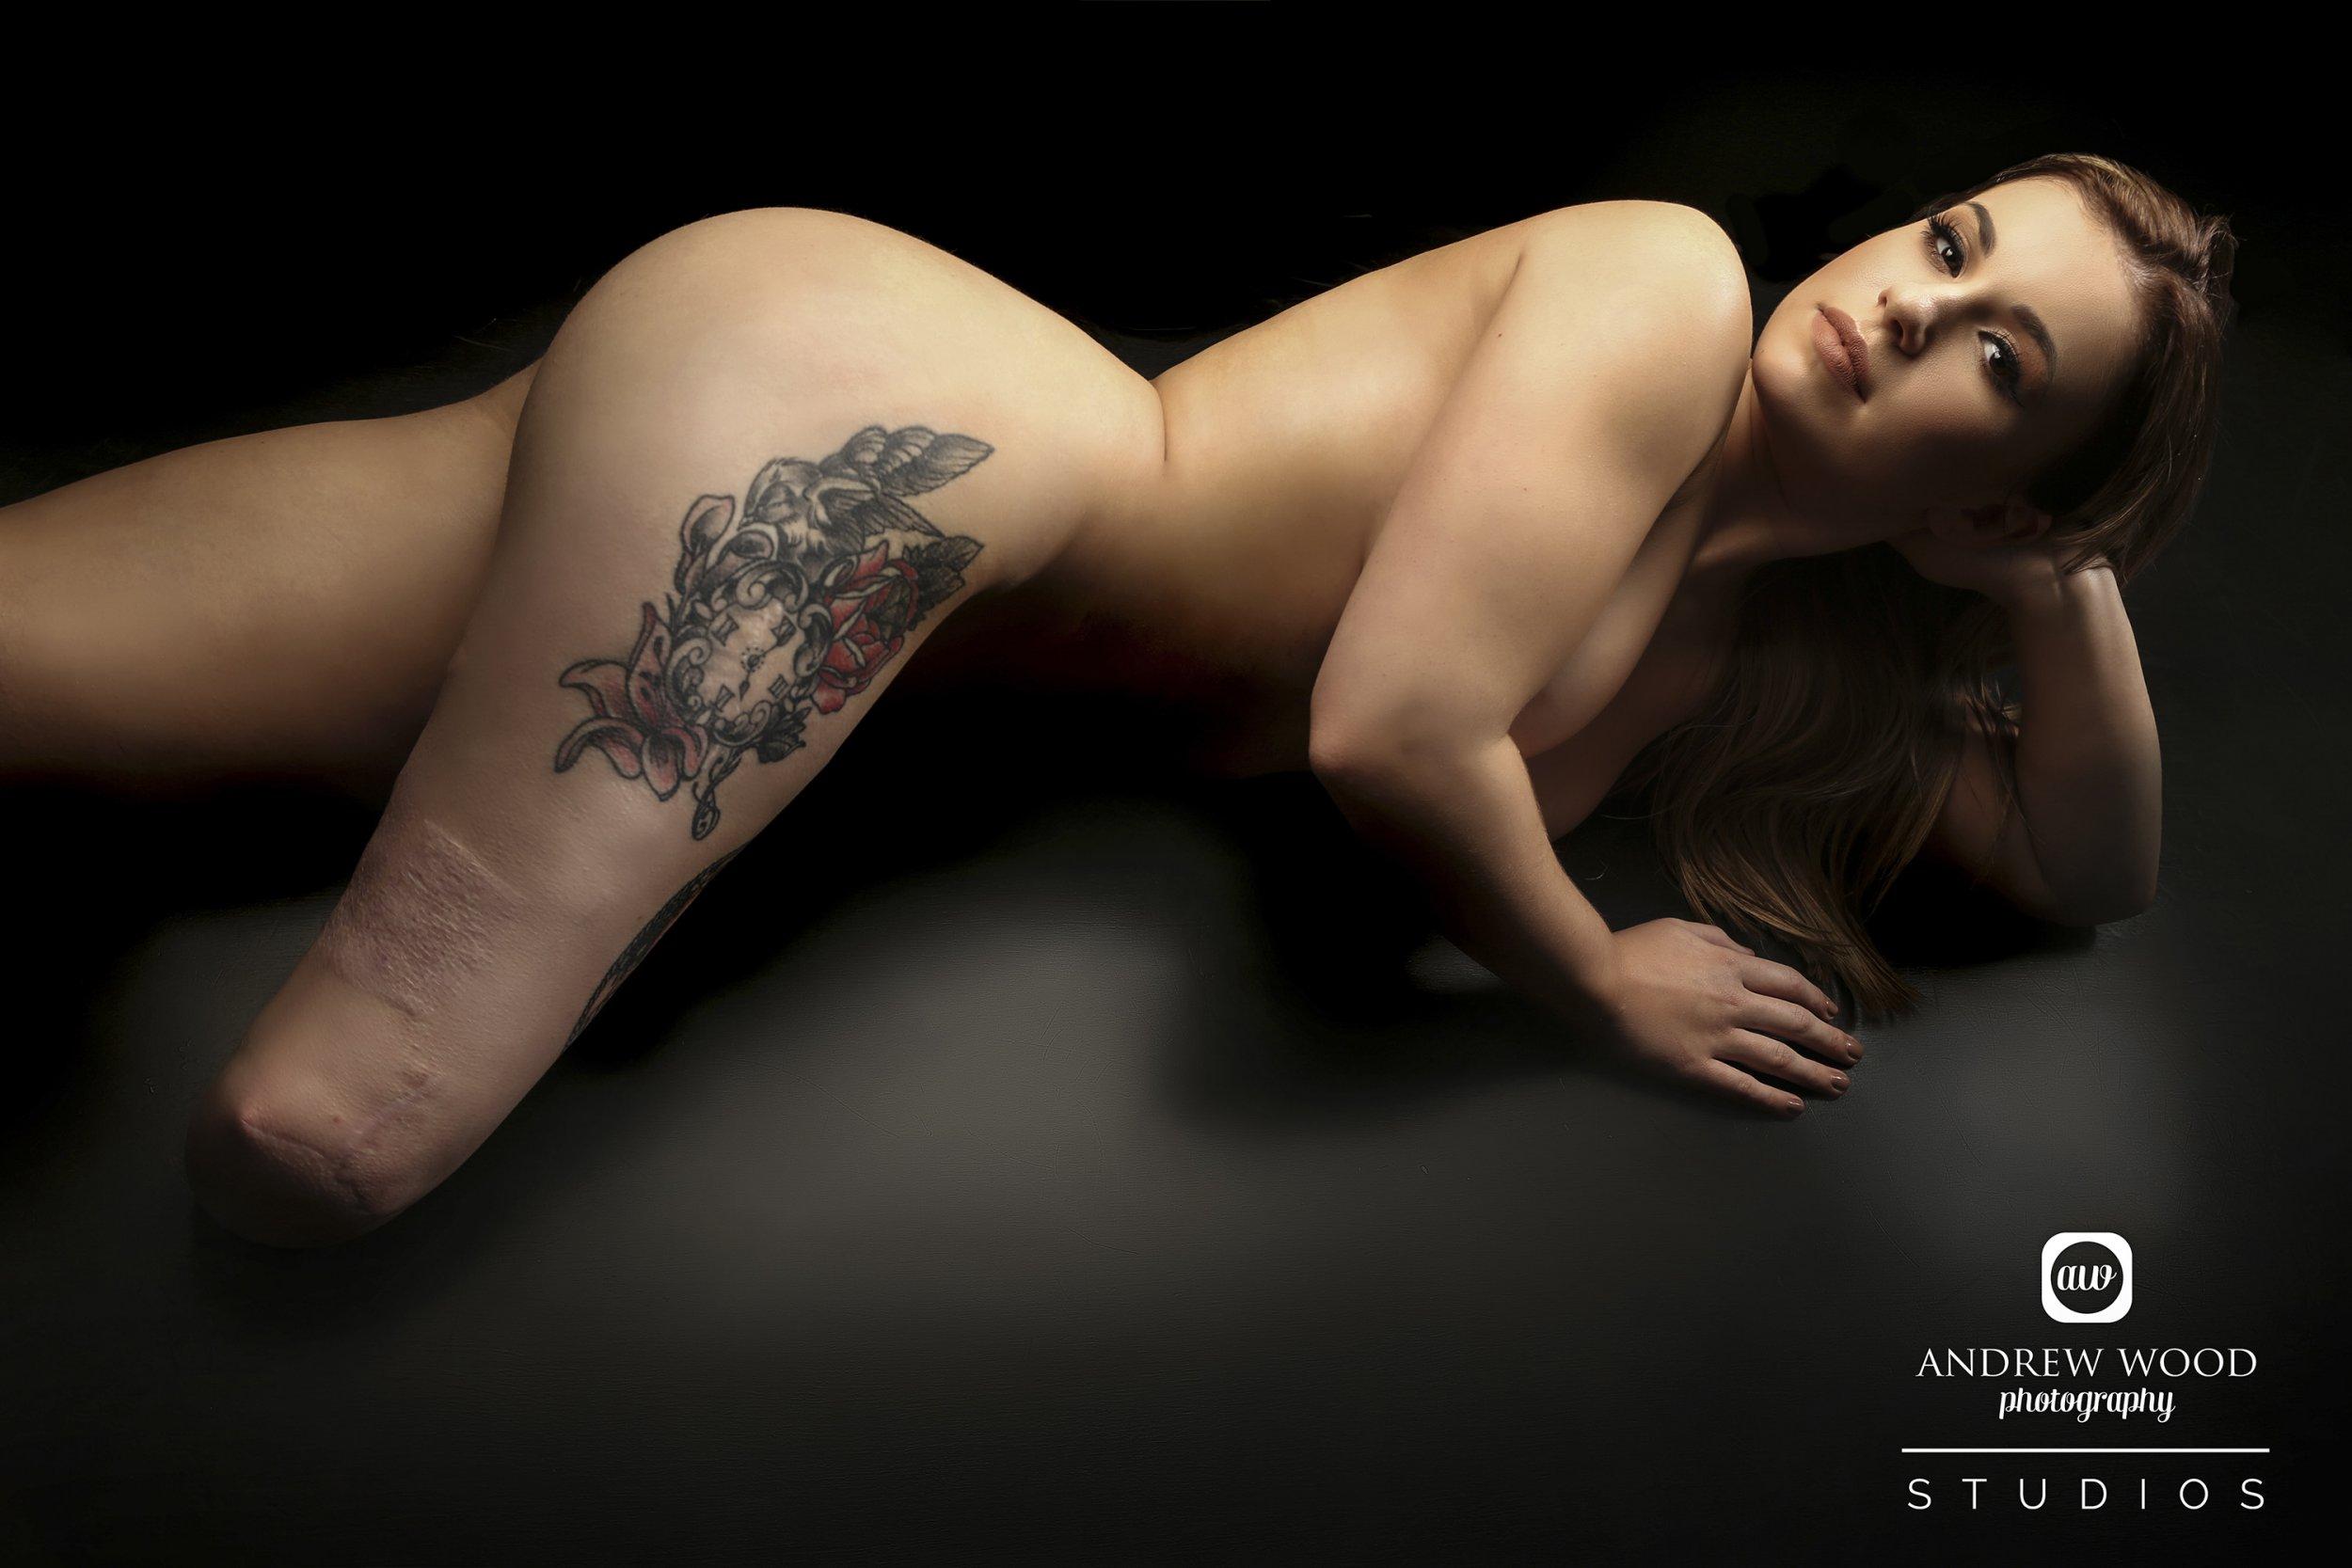 Photo of mature woman standing in panties